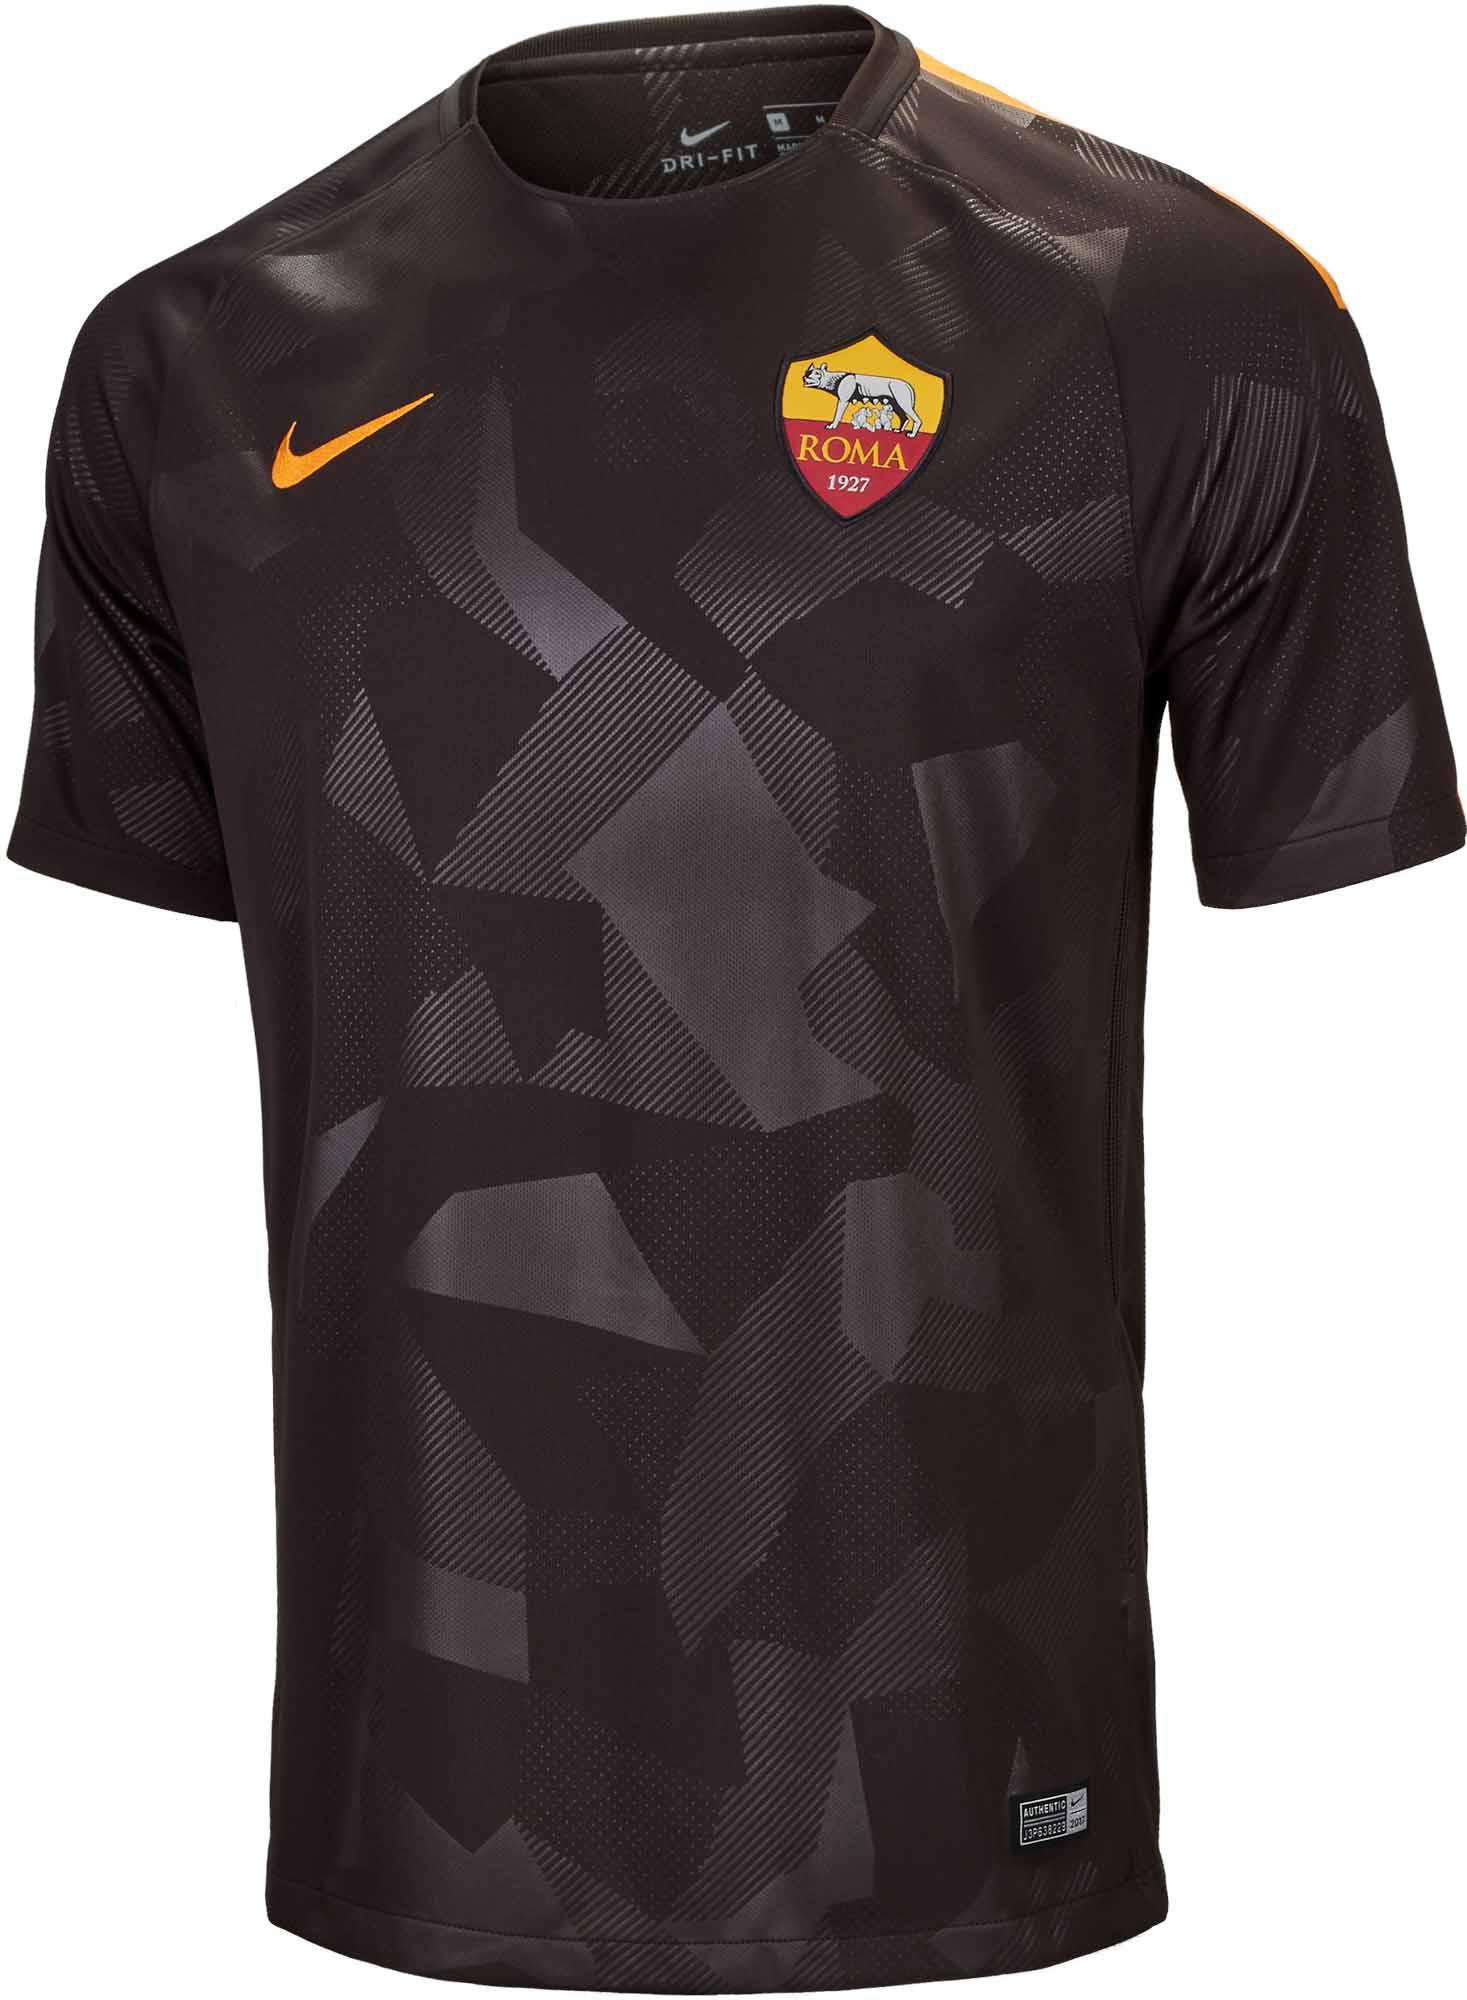 Nike As Roma 3rd Jersey 2017 18